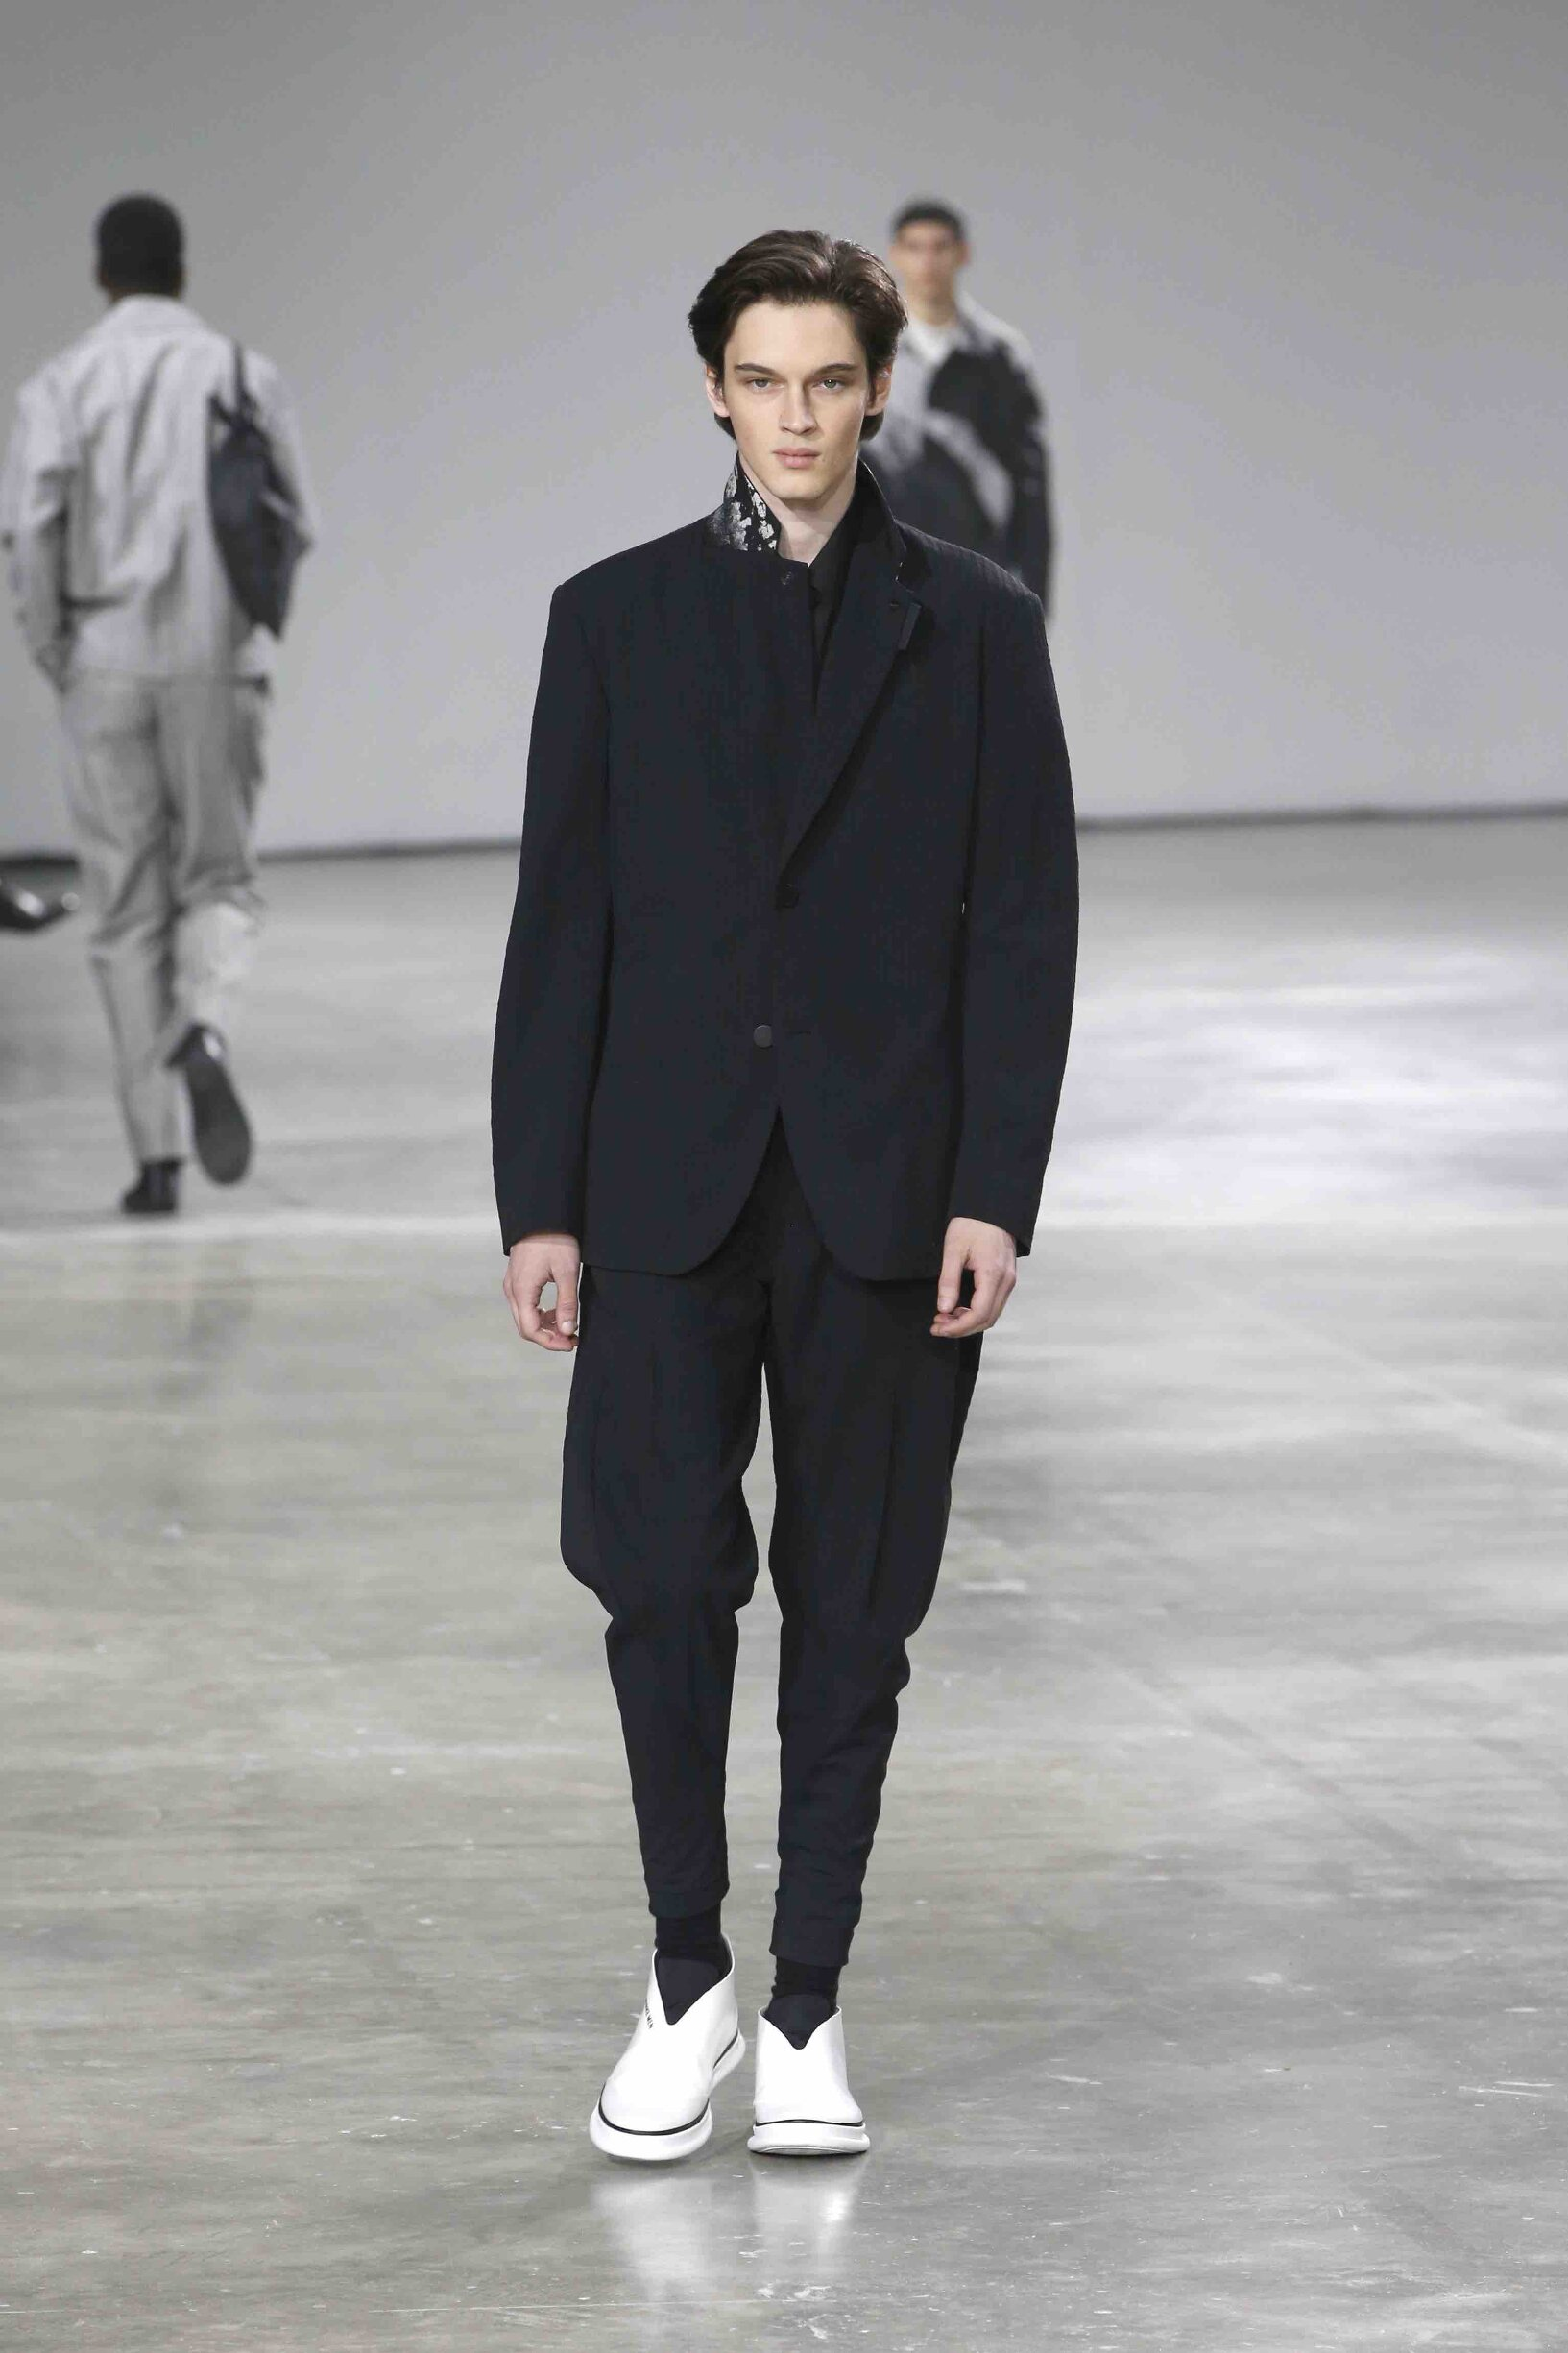 Issey Miyake Menswear Fashion Show